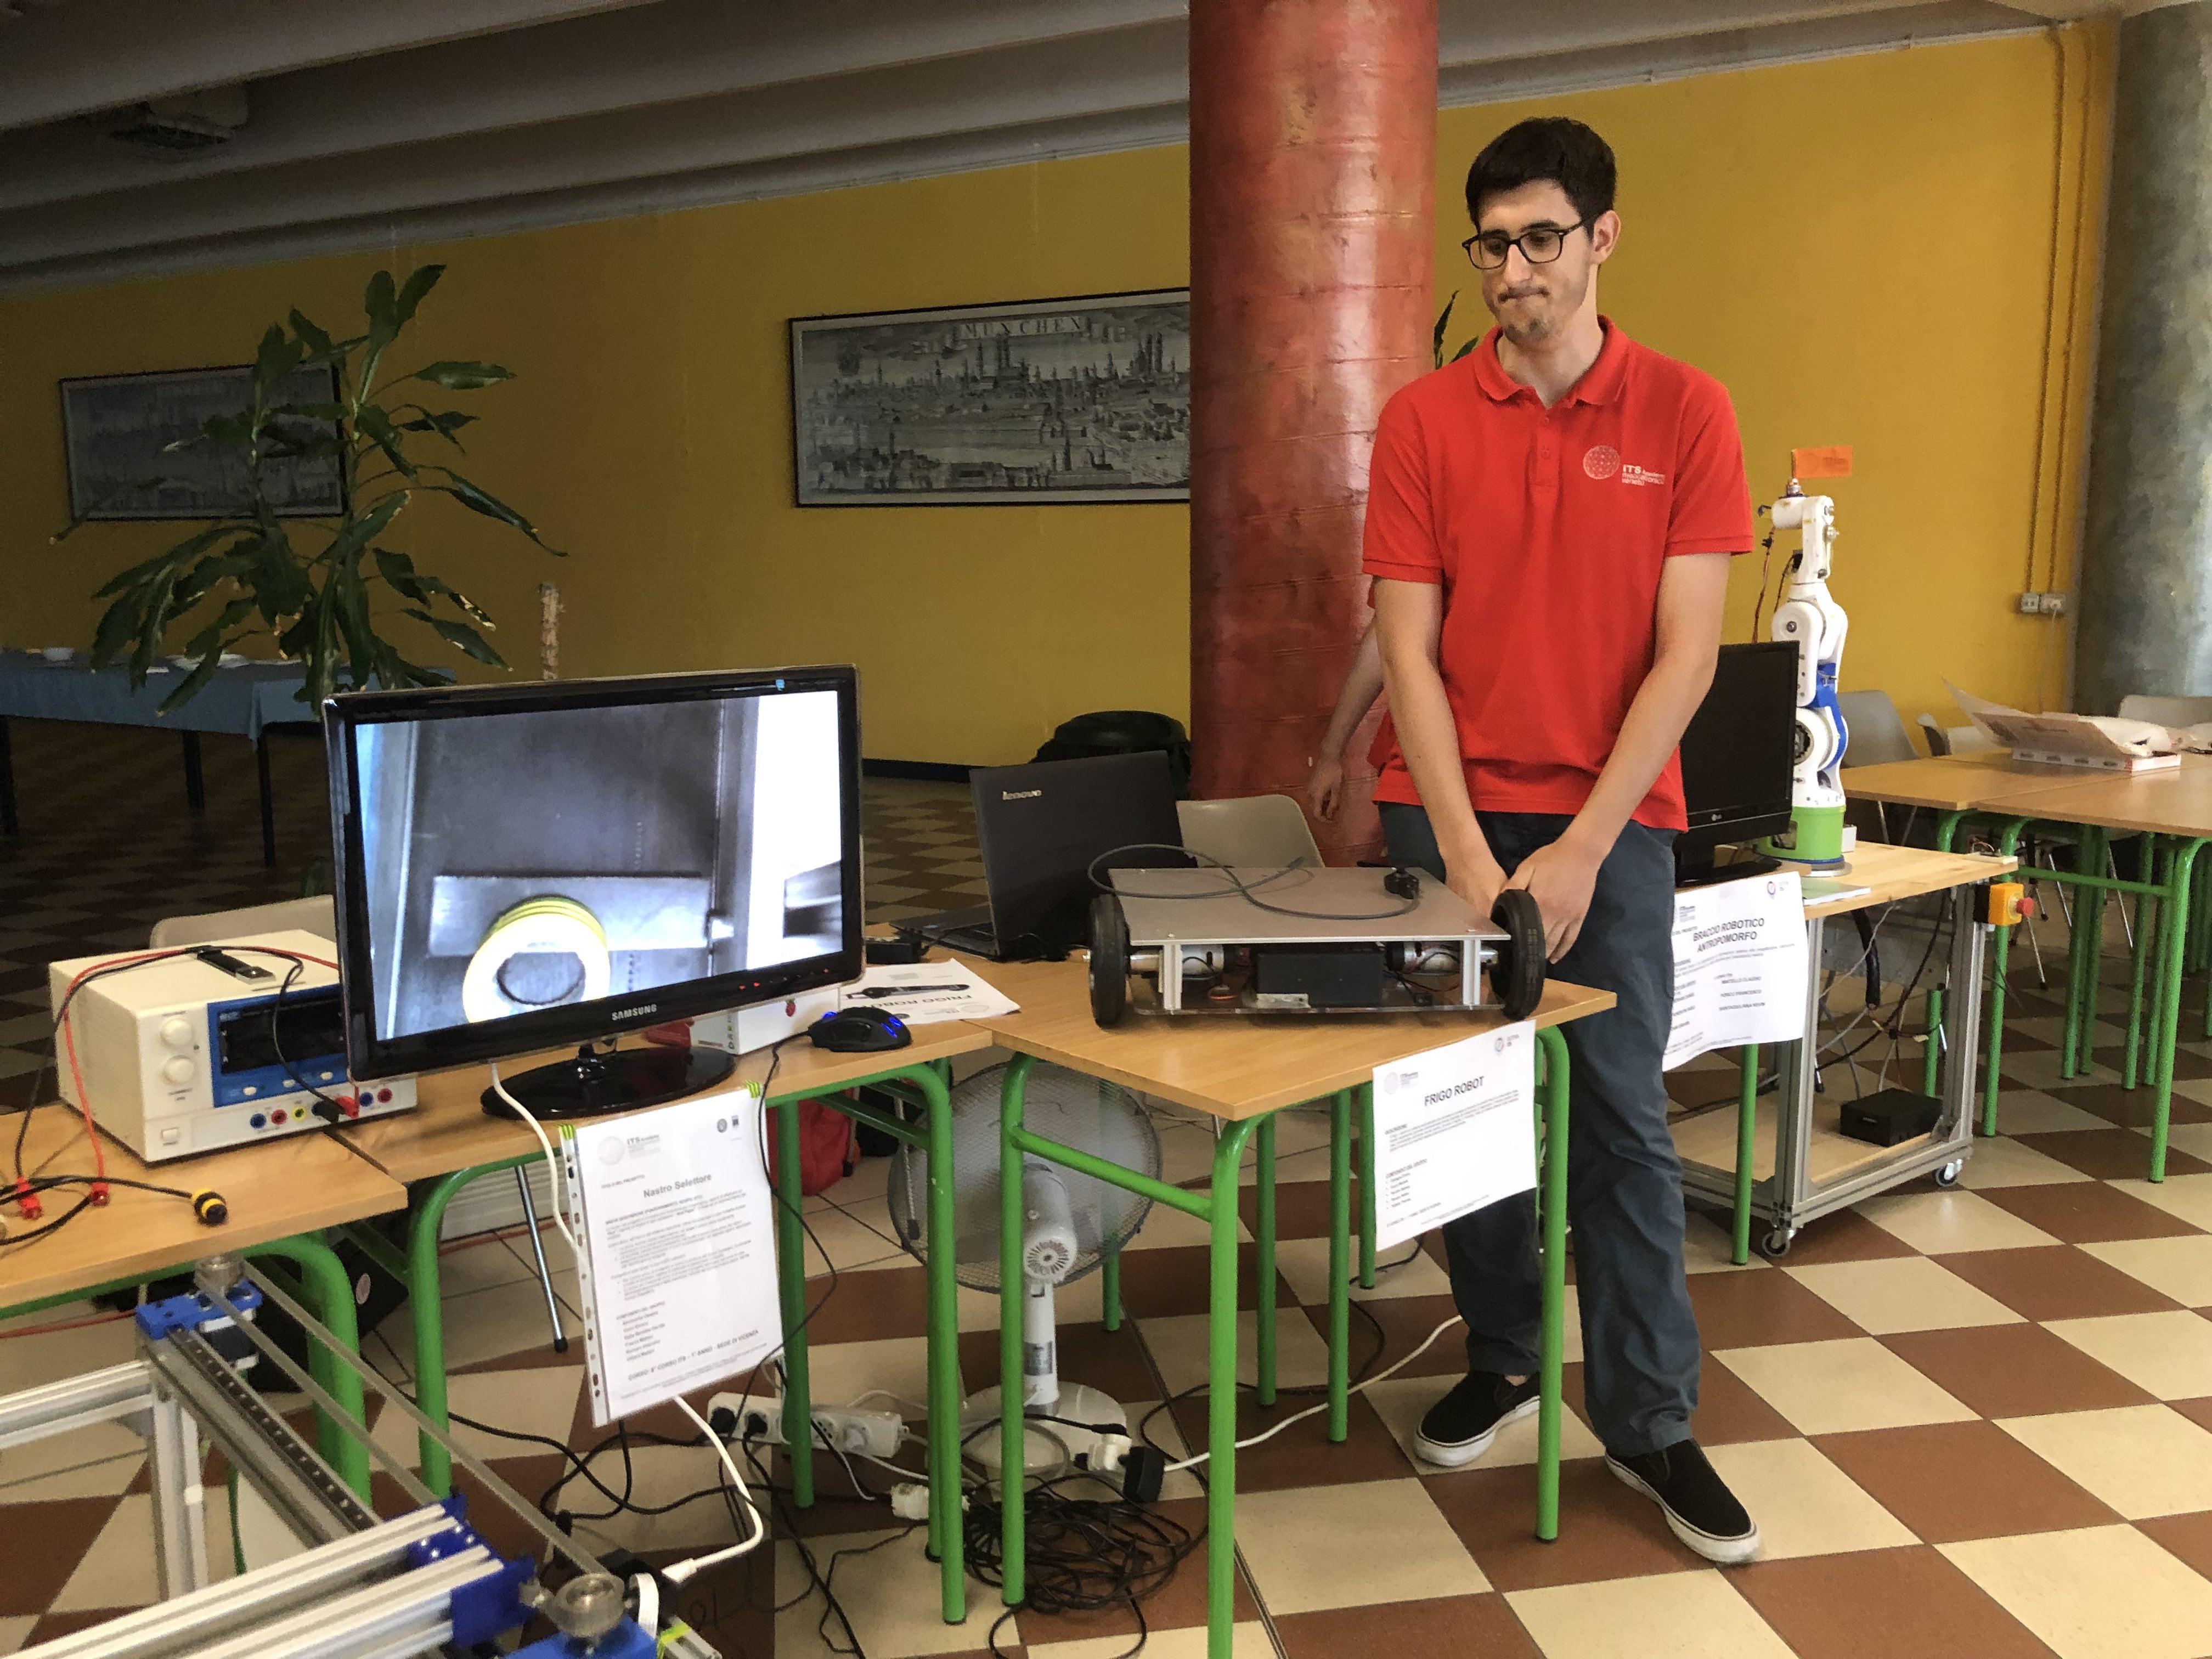 ITS Meccatronico Veneto_FRIGO ROBOT.jpg